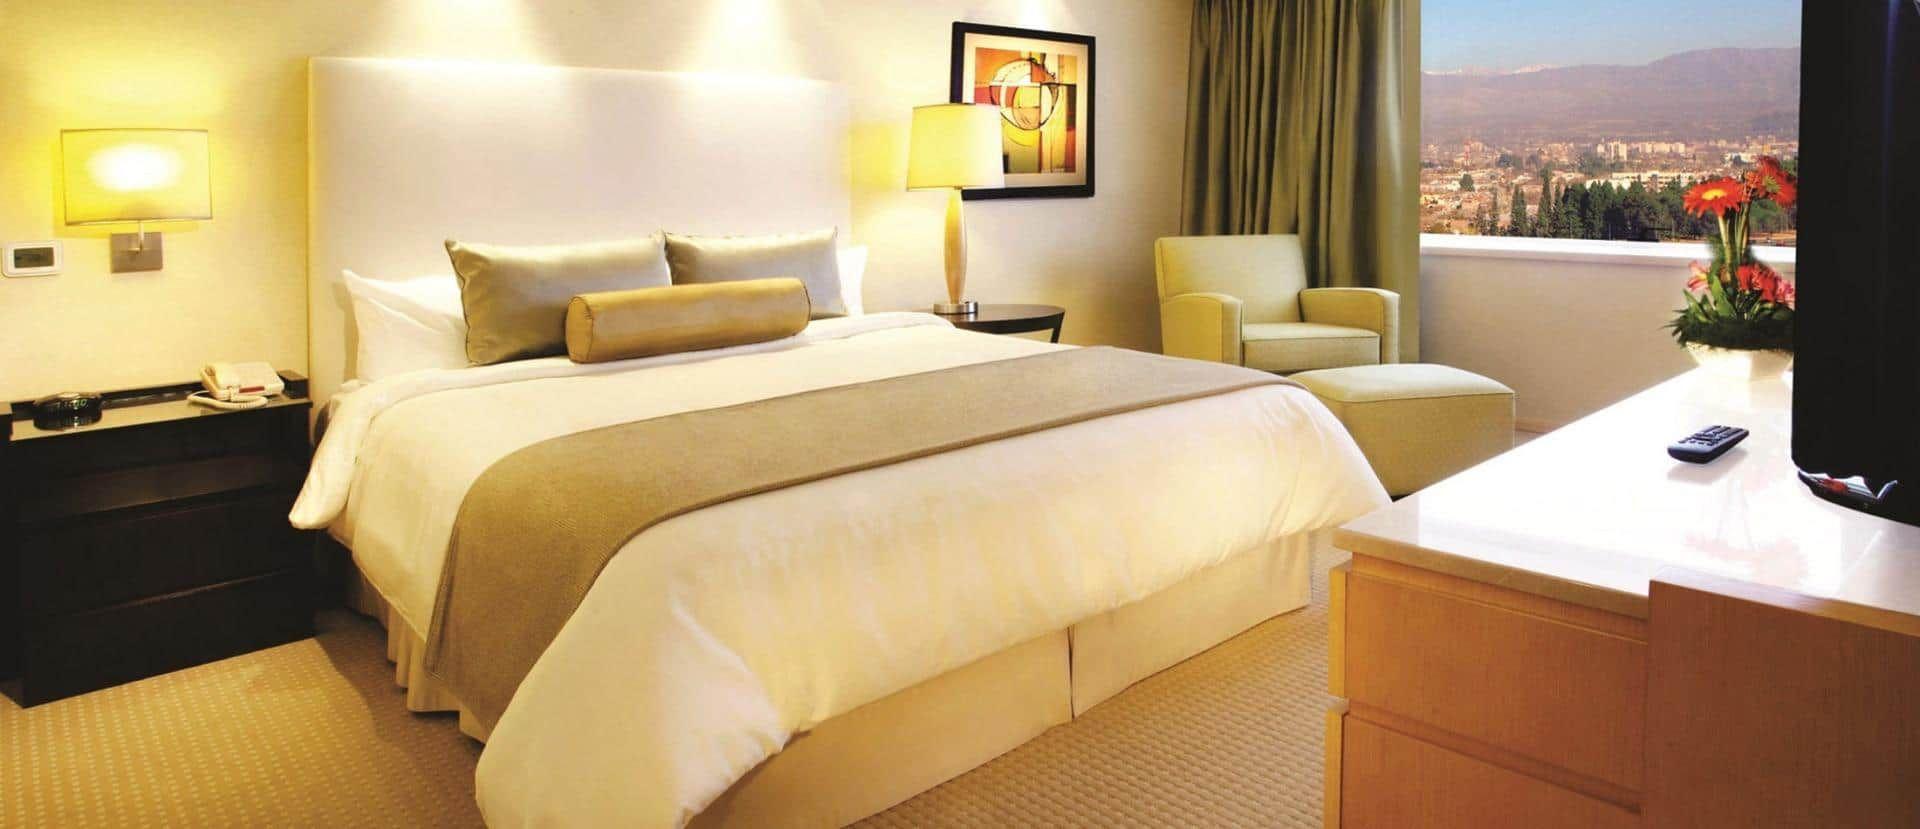 Hotel room at the Intercontinental Mendoza